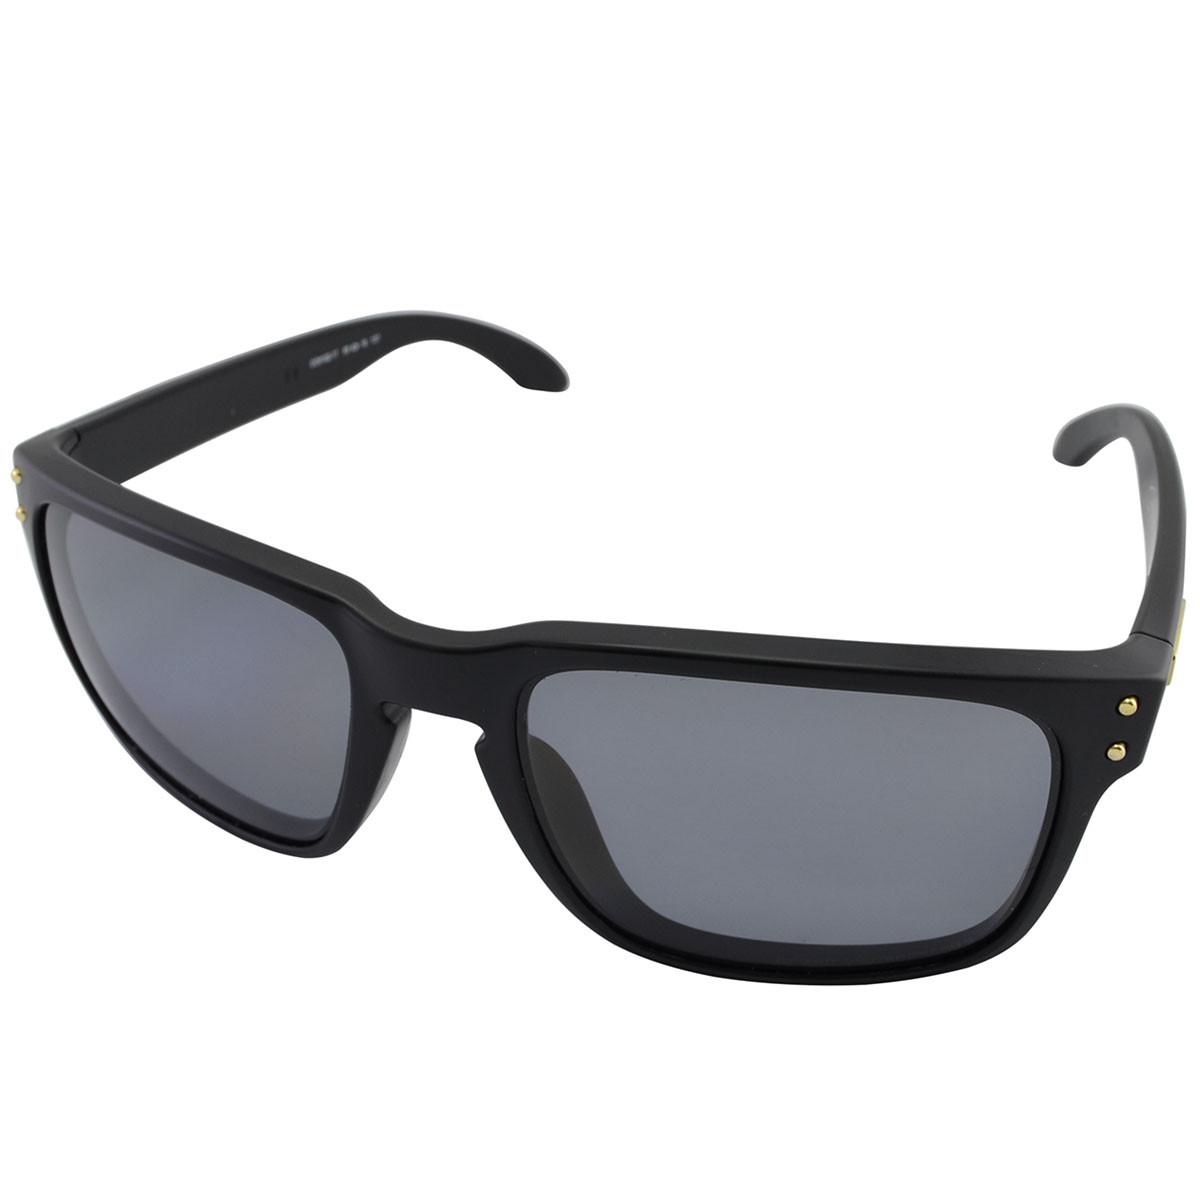 4f735f5f62a6f Óculos Oakley Holbrook Shaun White Gold Signature Matte Black Lente ...